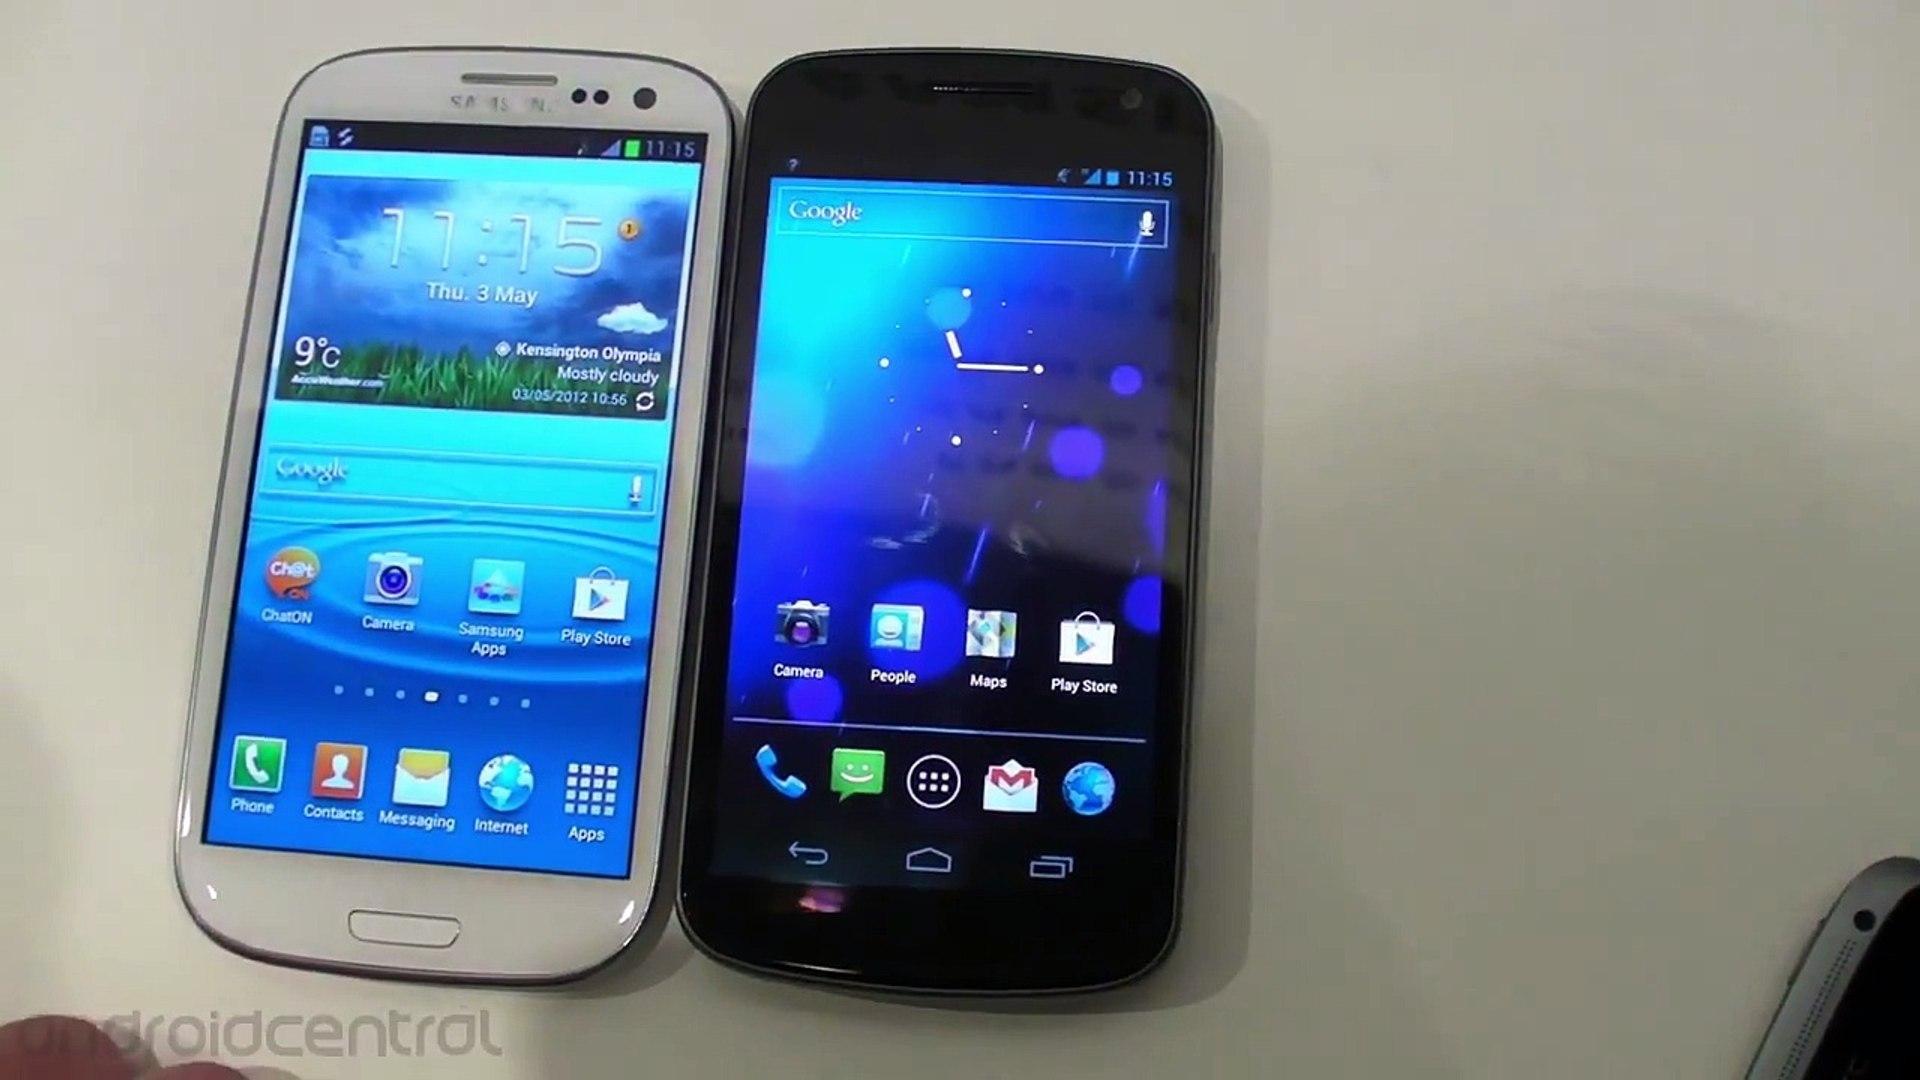 Samsung Galaxy S III versus the Samsung Galaxy Nexus